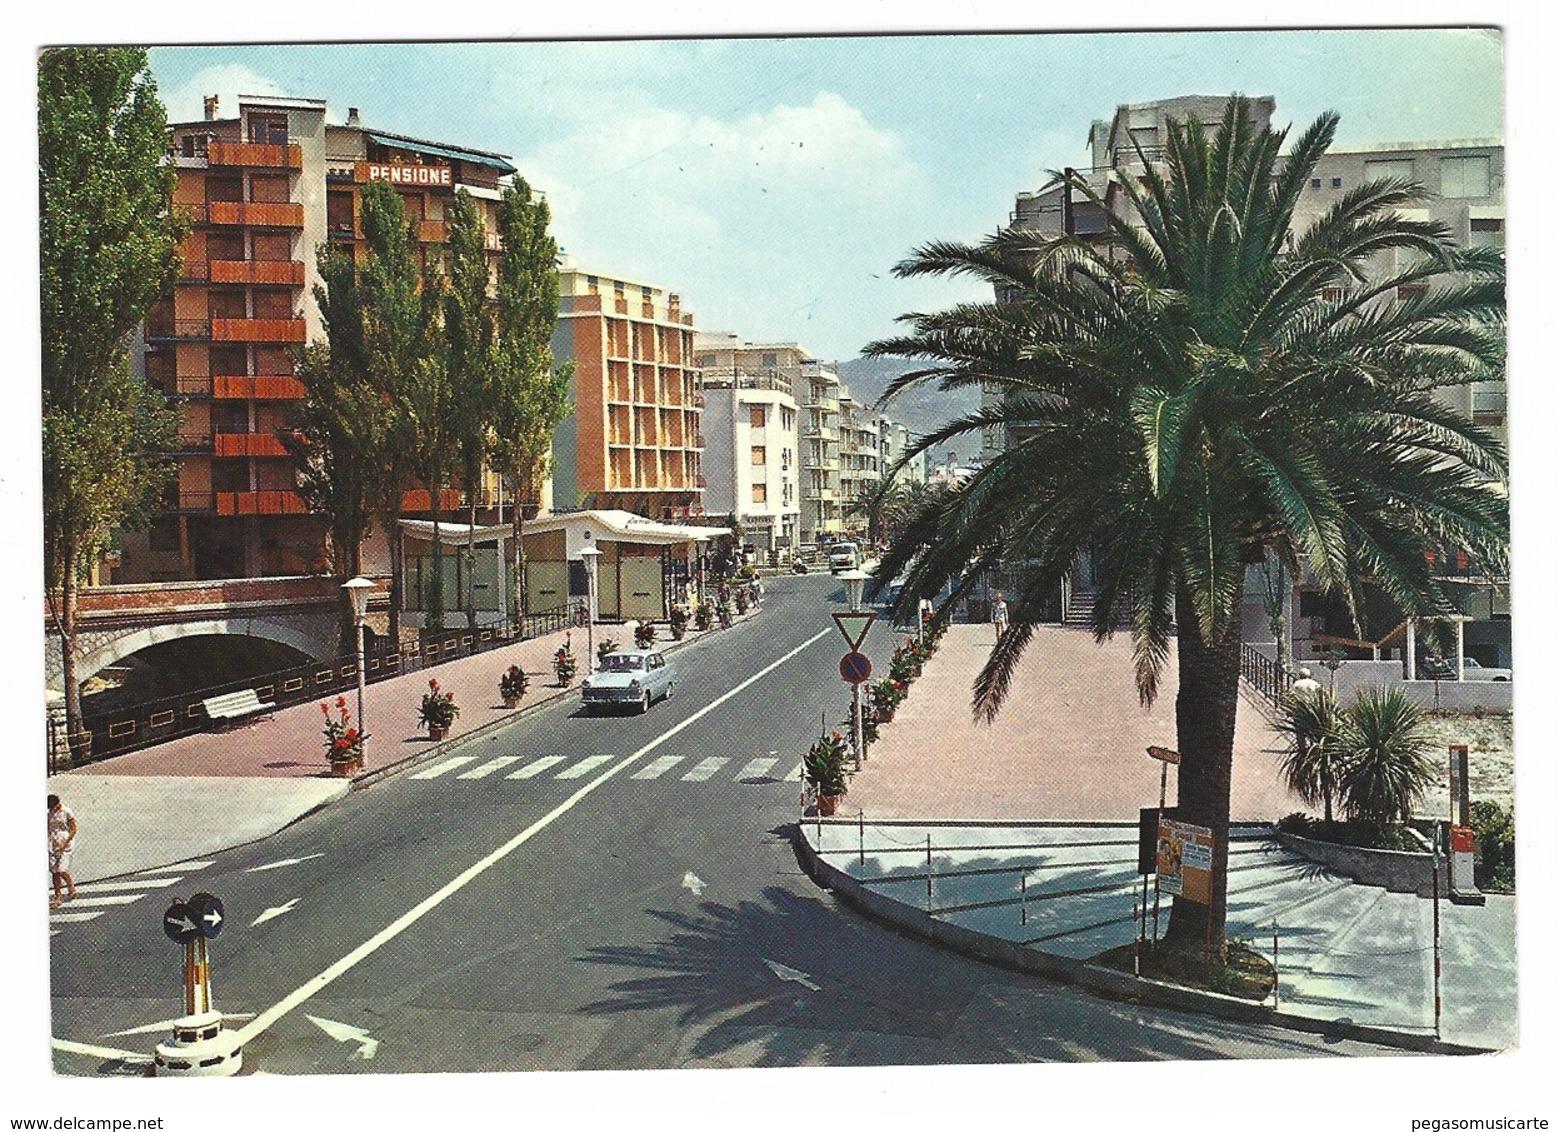 2176 - PIETRA LIGURE SAVONA CORSO ITALIA PONTE MAREMOLA 1962 - Savona